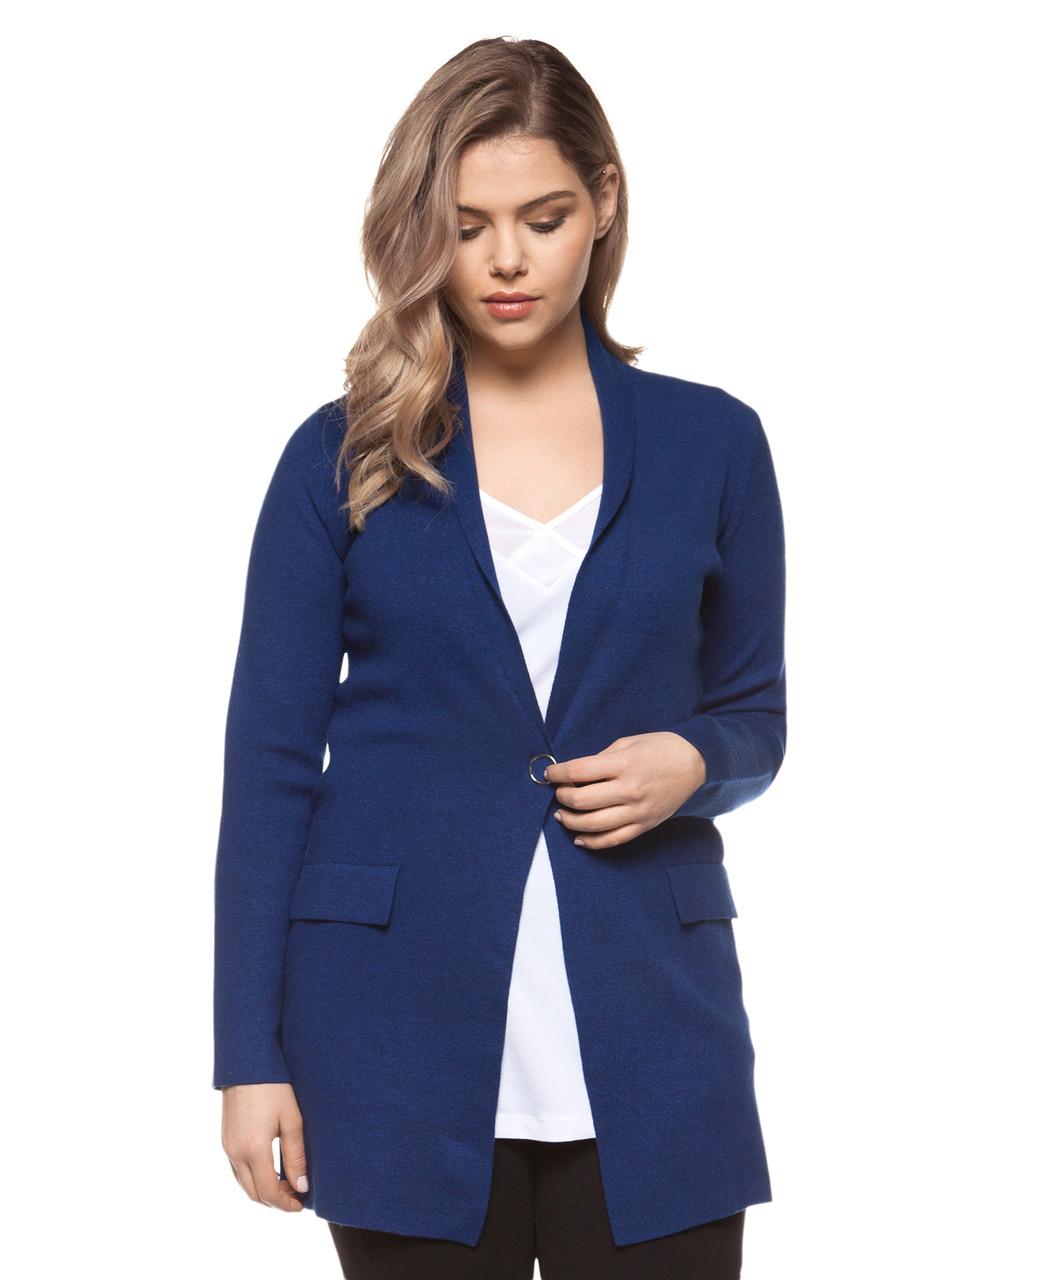 3b3160188a073 Women s blue stone plus size blazer